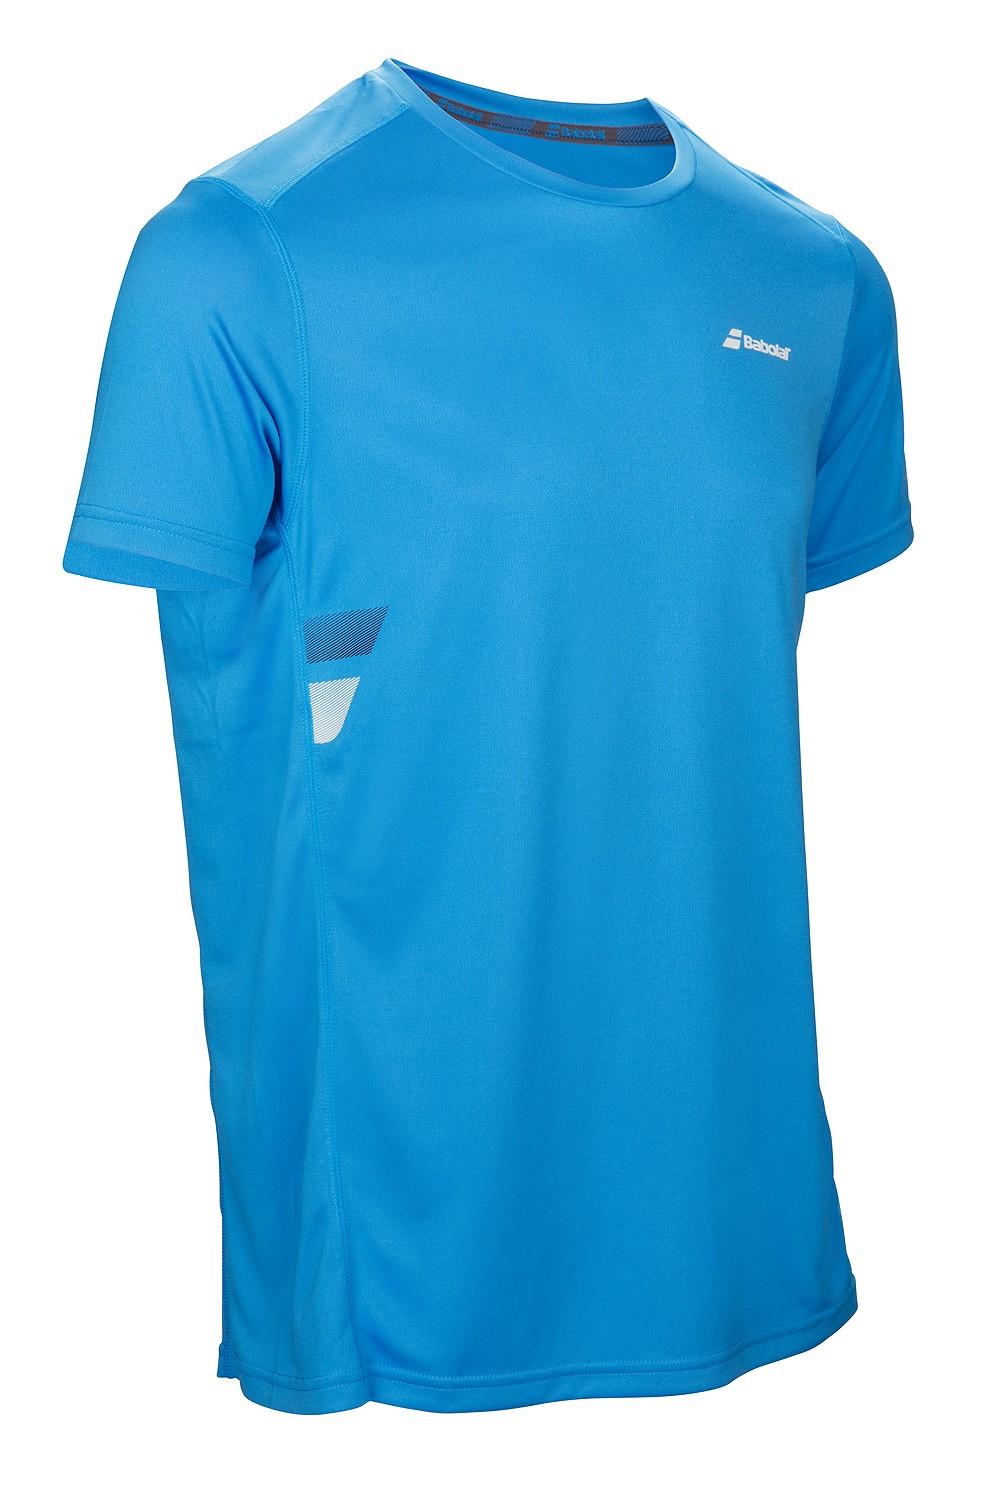 Koszulka tenisowa Babolat Flag Core Tee Drive Blue - wyprzedaż!